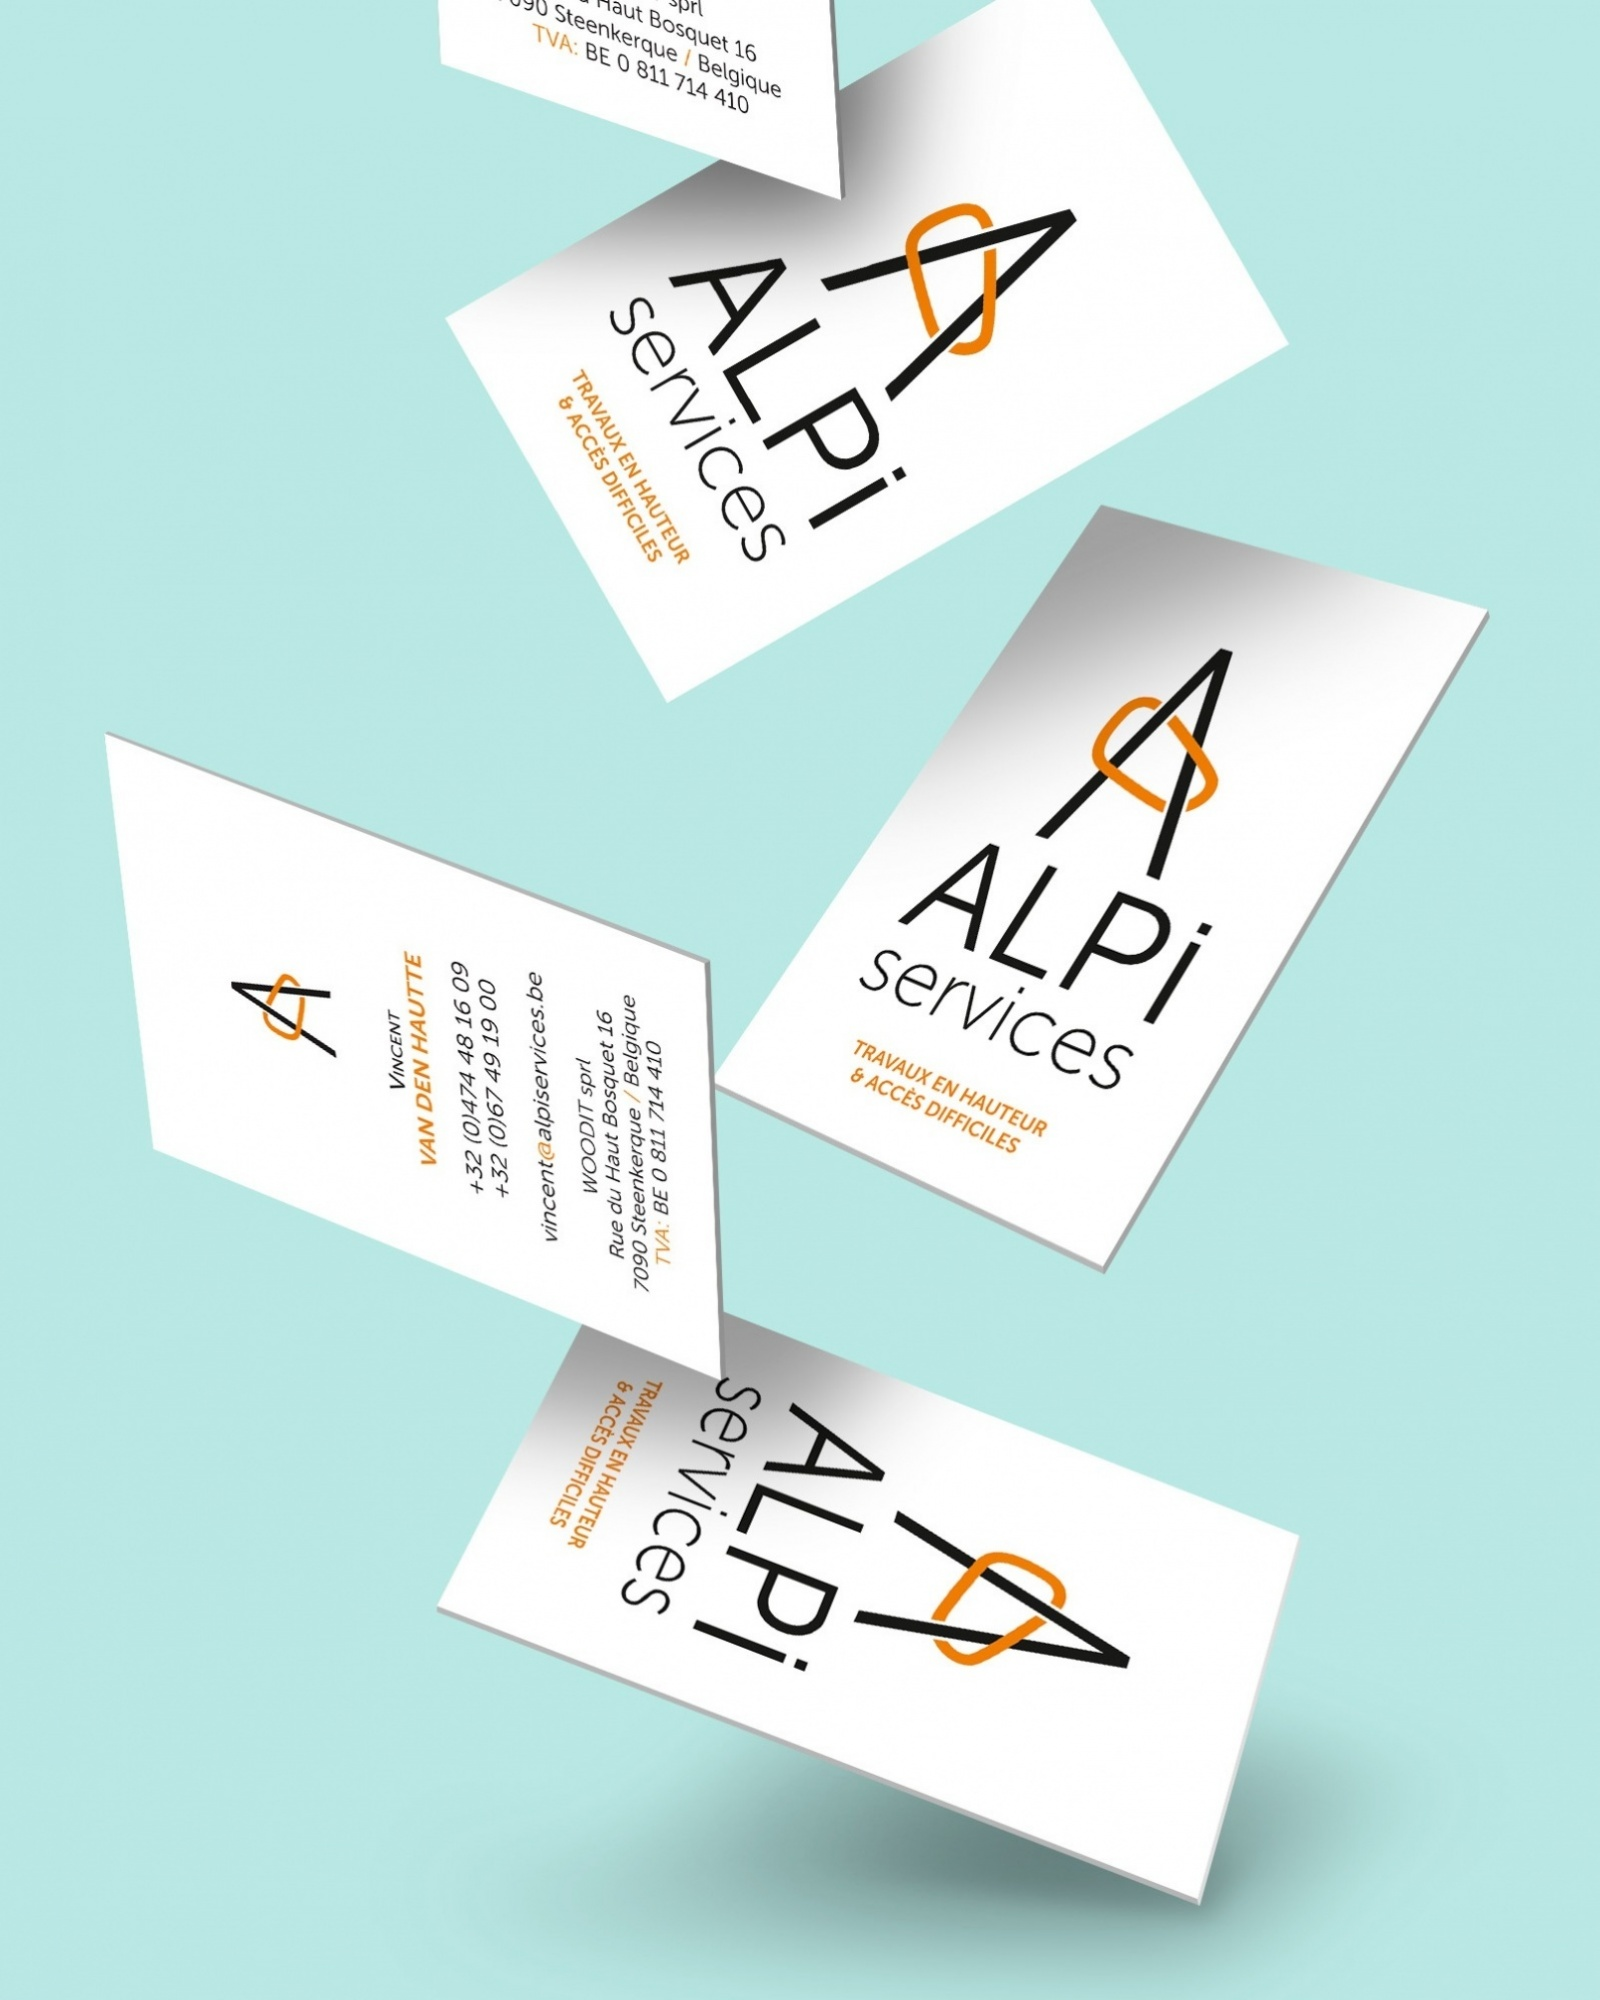 0_Alpi services